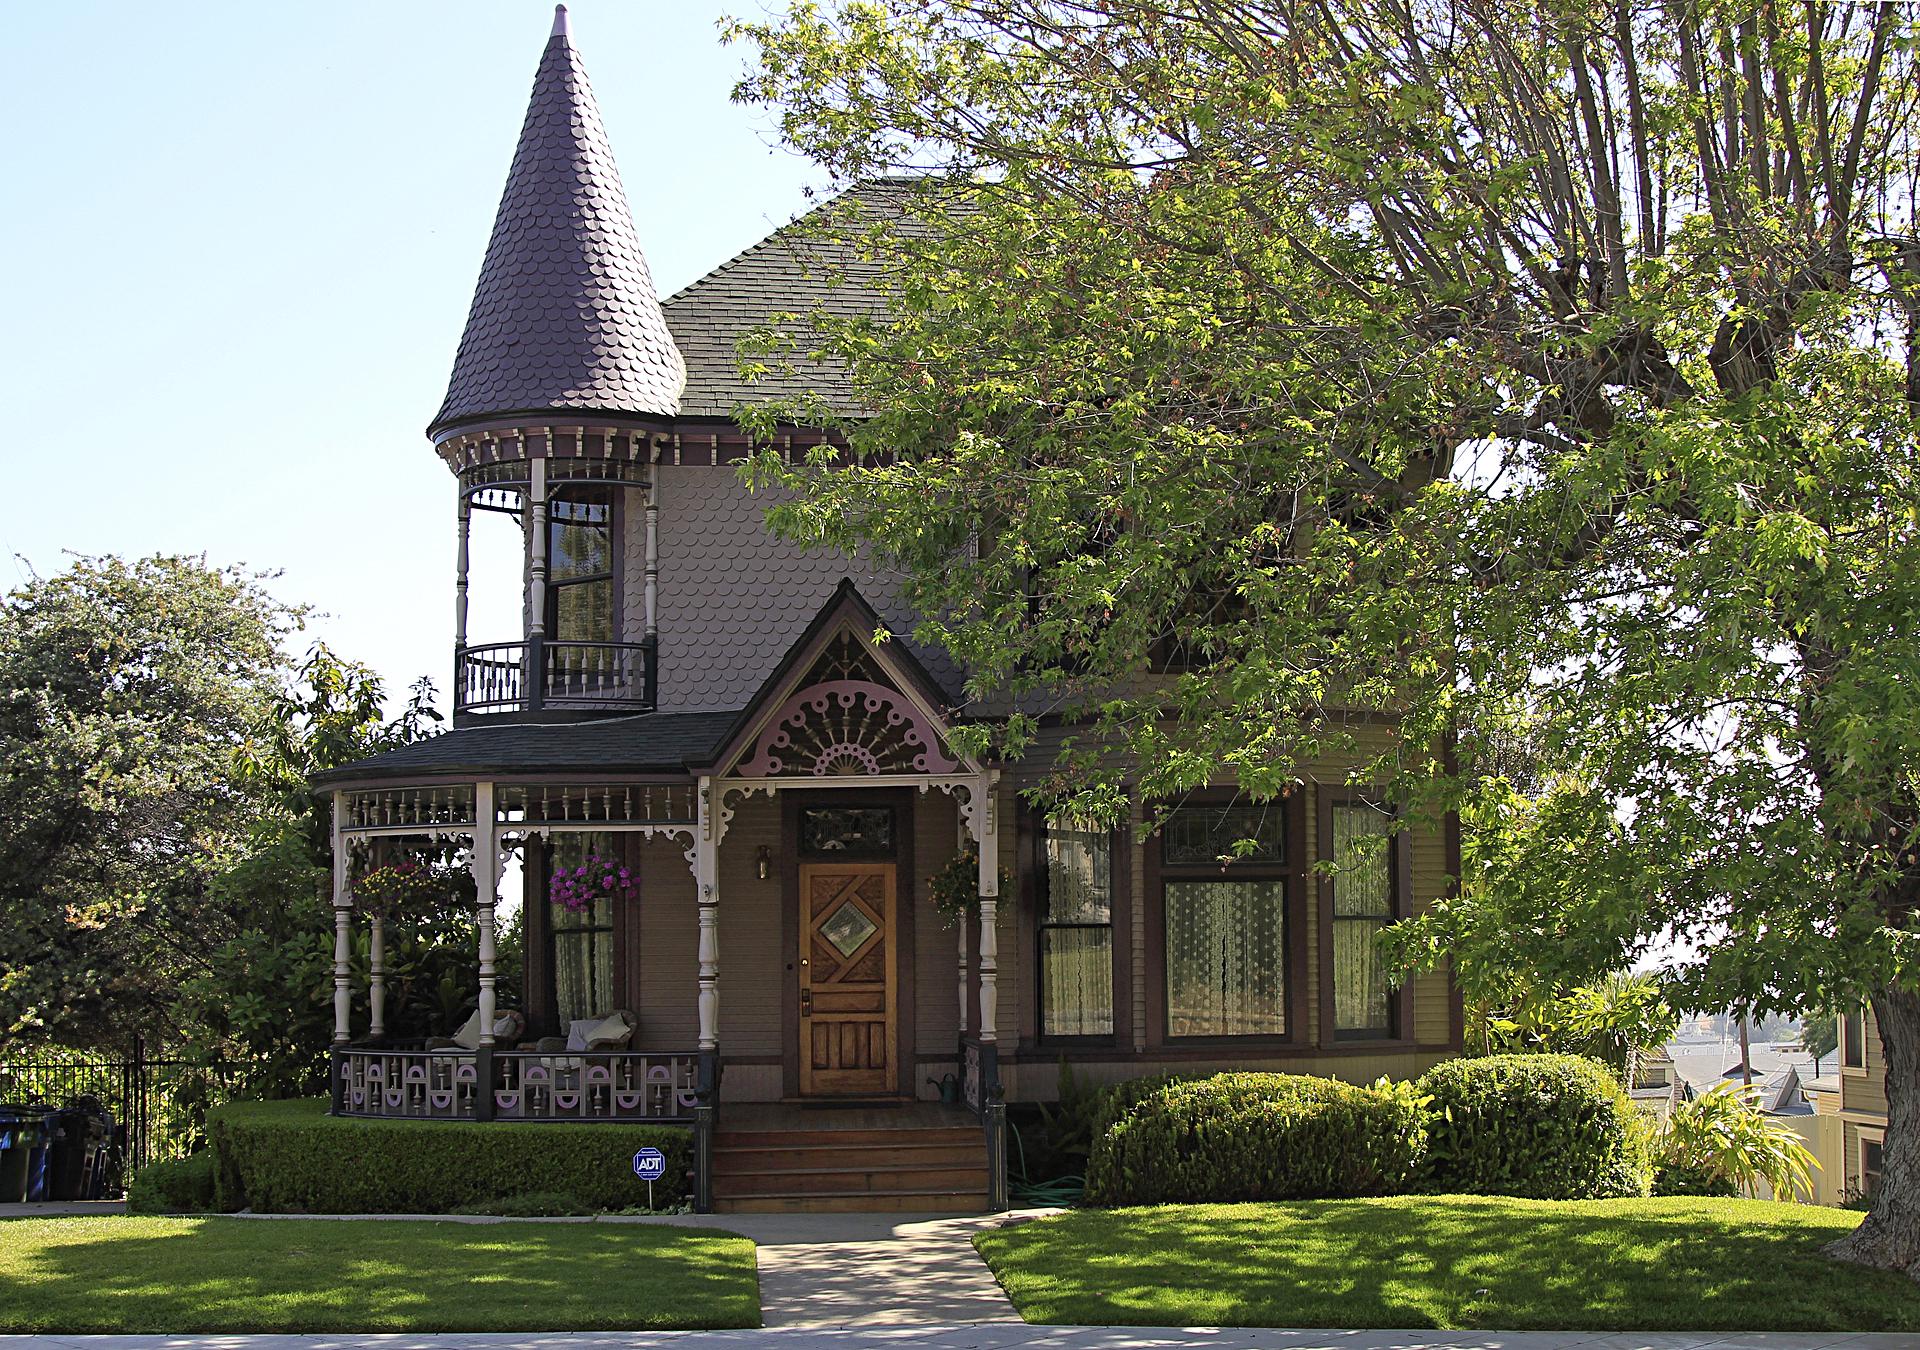 J. Haskins House, 1888